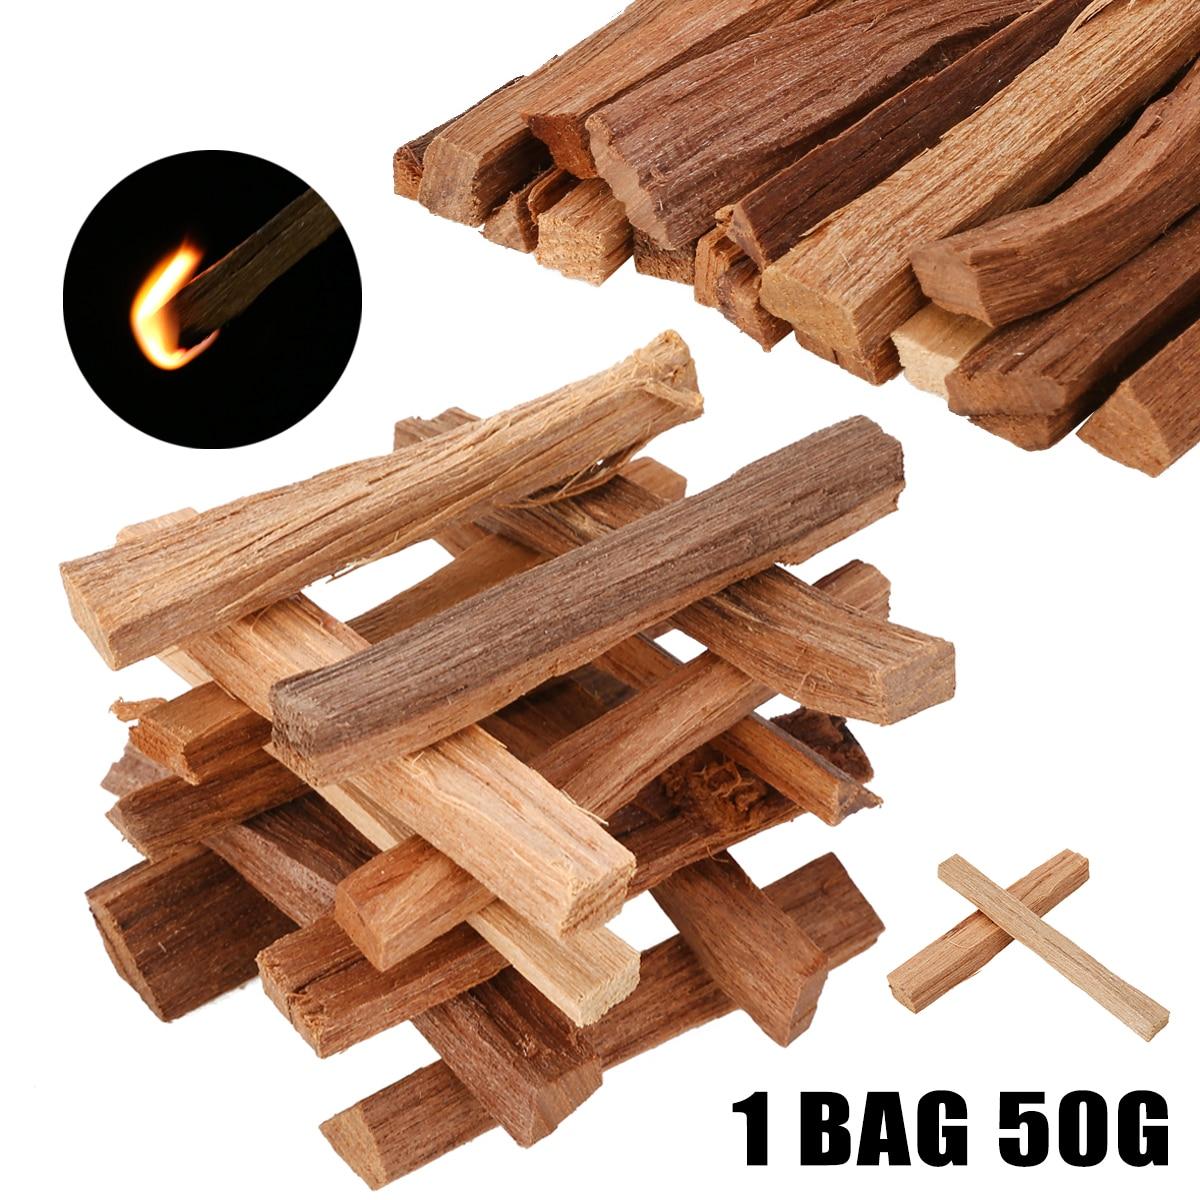 50g 7CM Aromatic Fragrance Sandal Wood Chips Sandalwood Incense Sticks Irregular Resin Home Office DIY Craft Supplies Mayitr